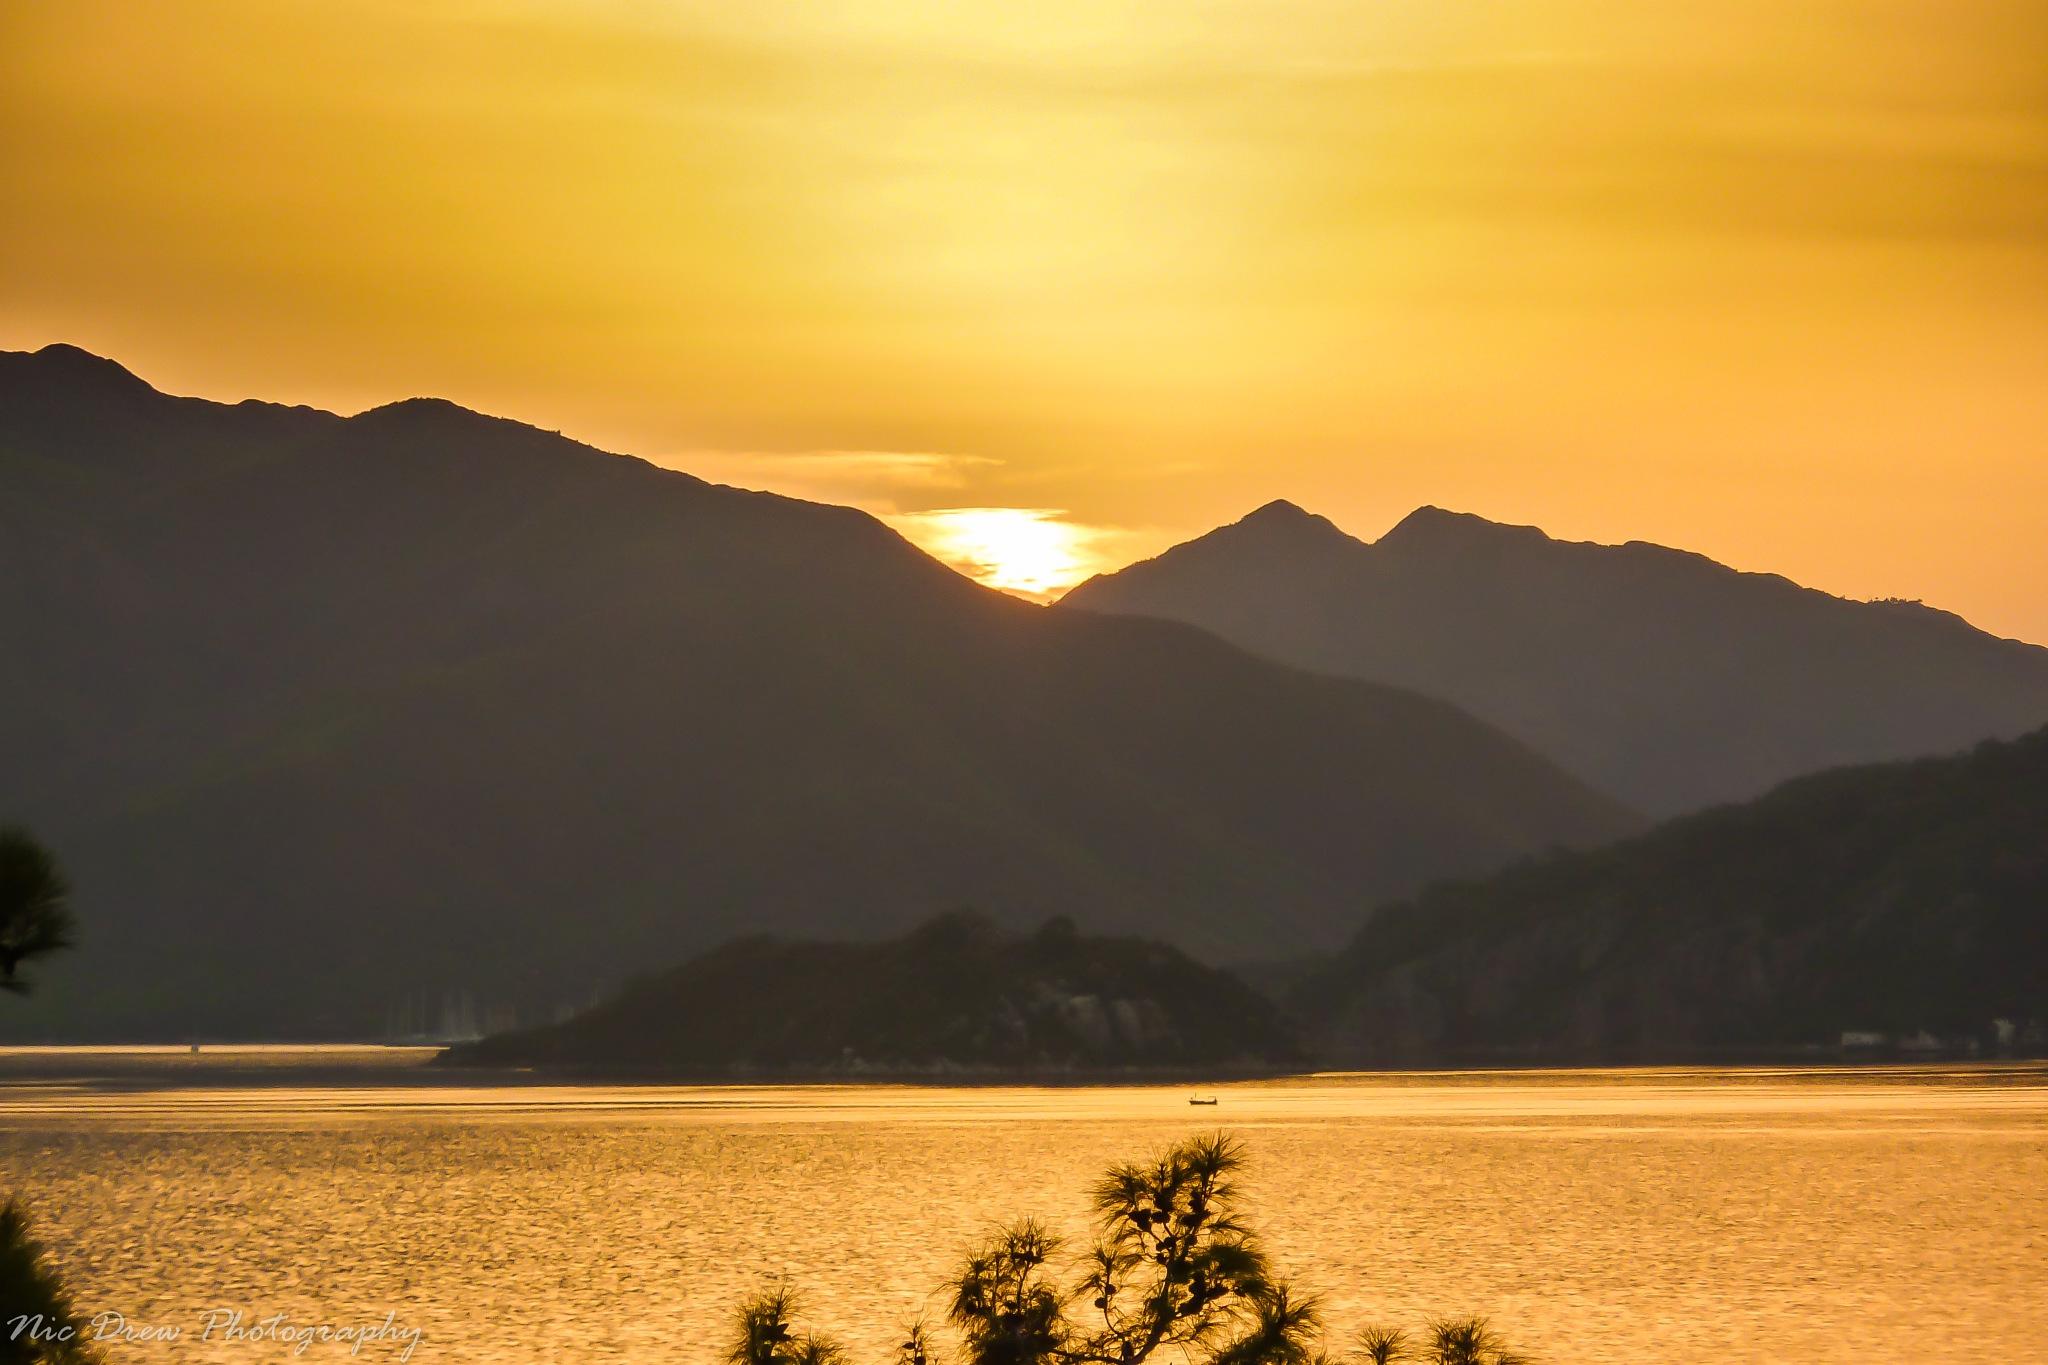 Sunrise by Nic Drew